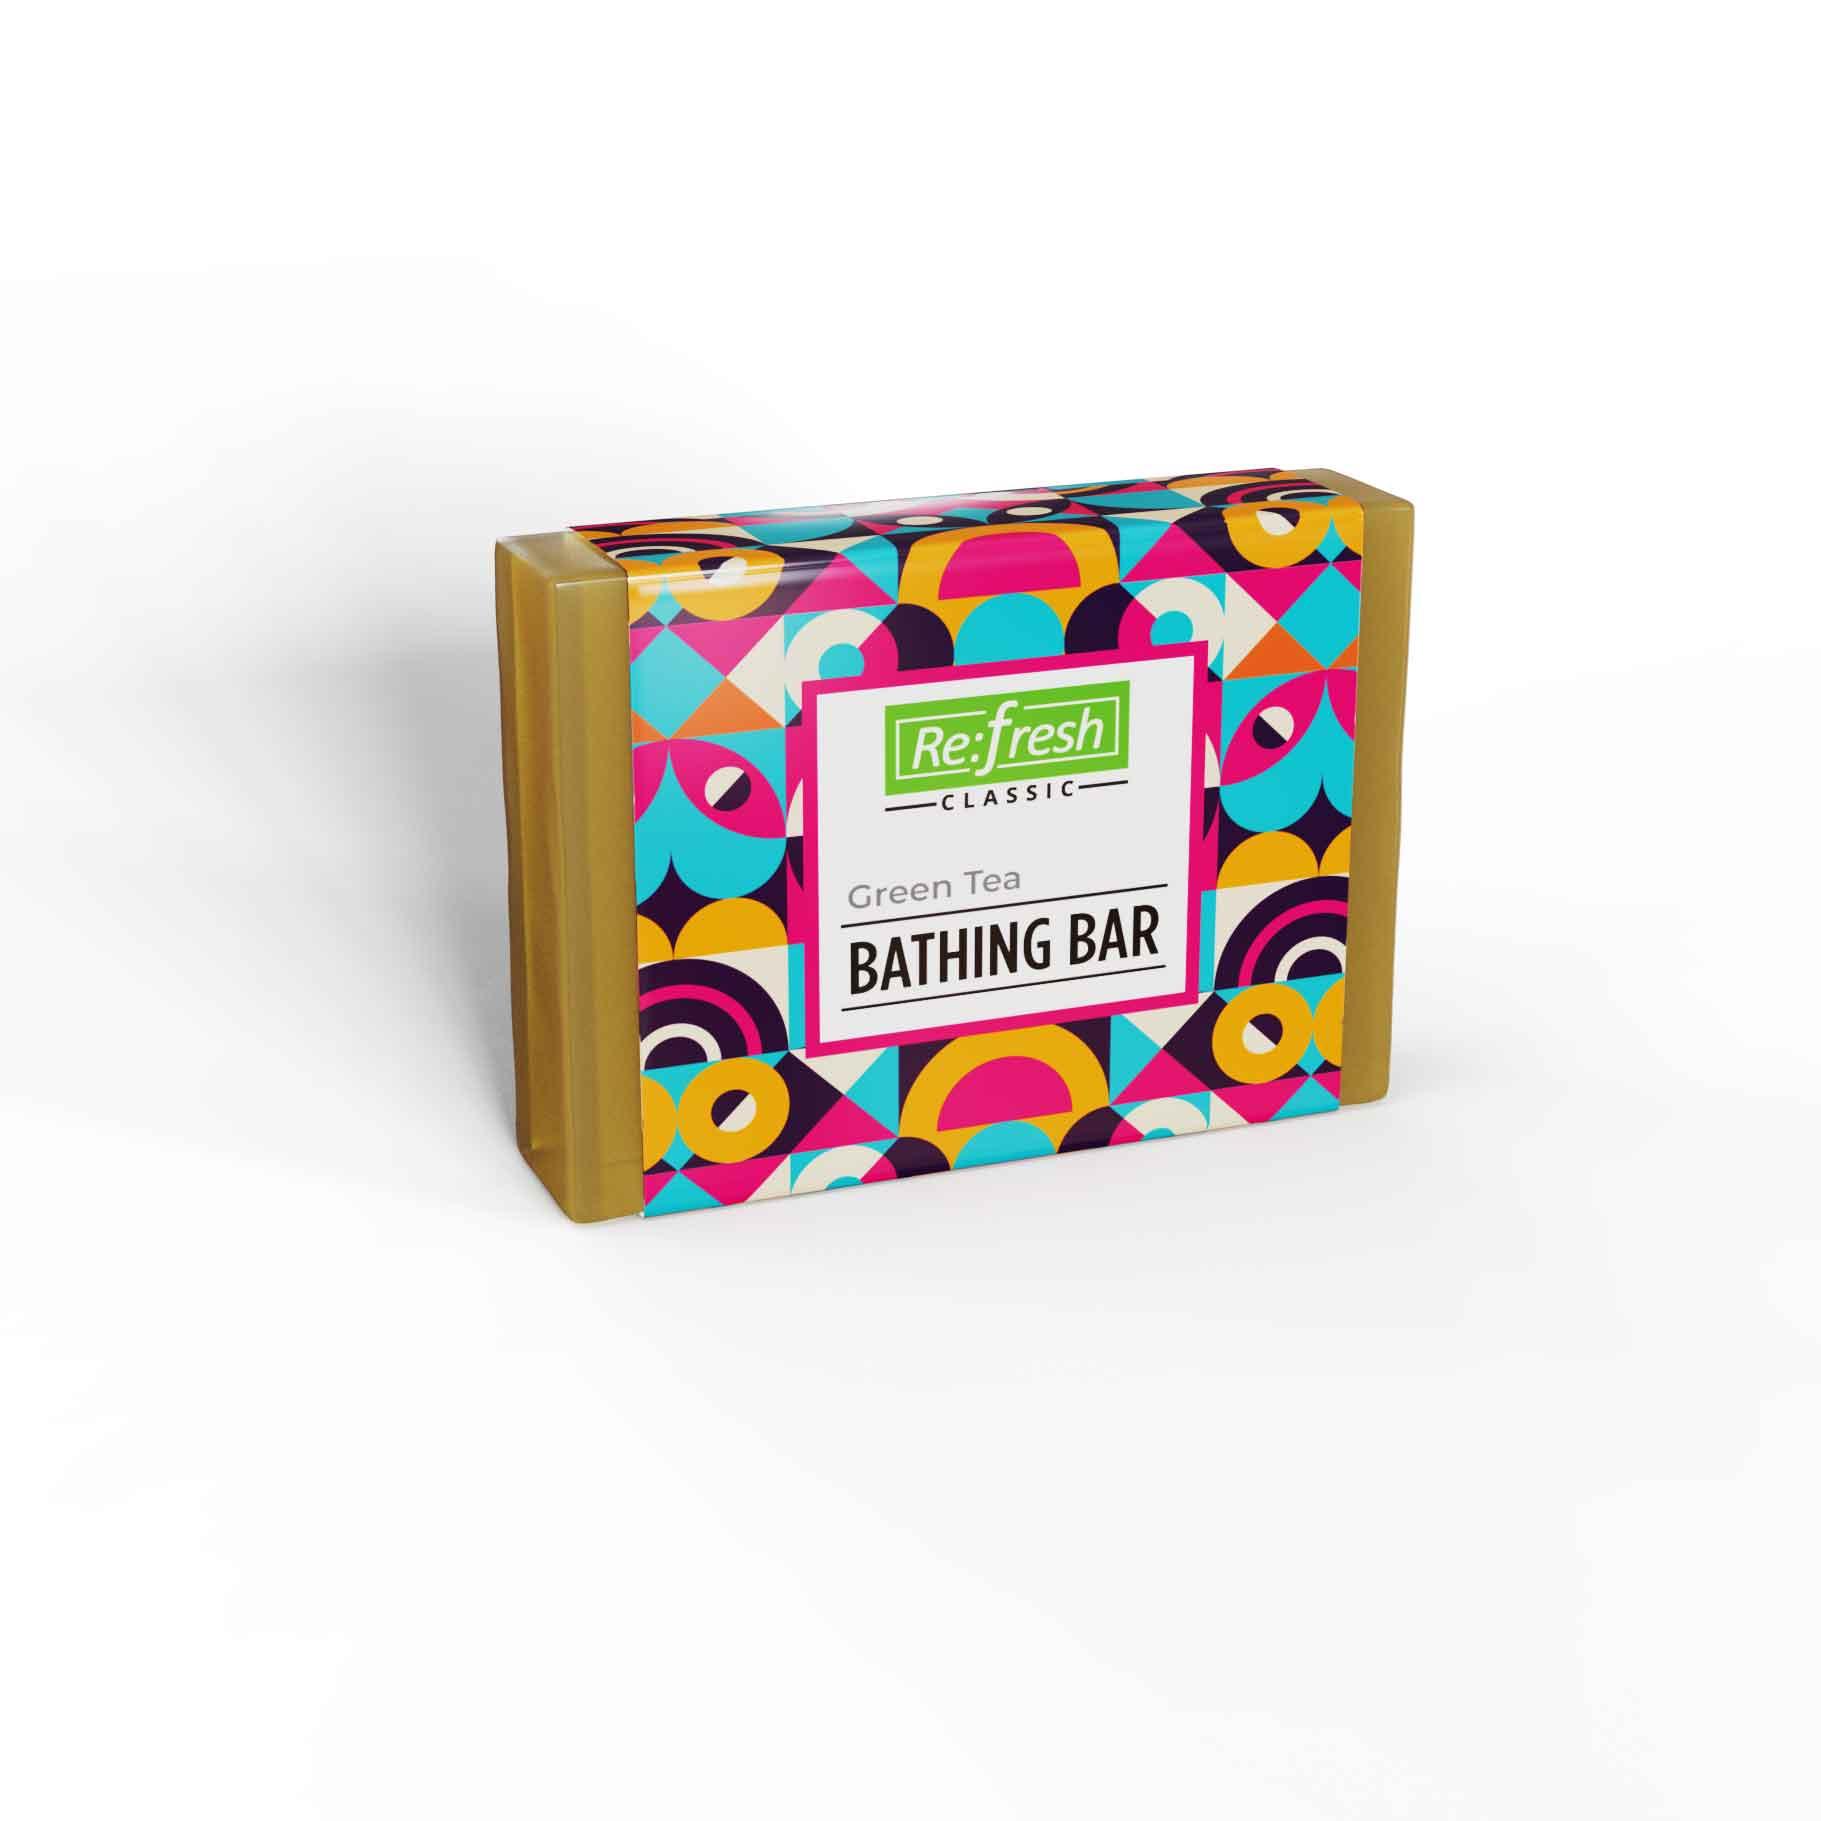 GREEN TEA BATHING BAR